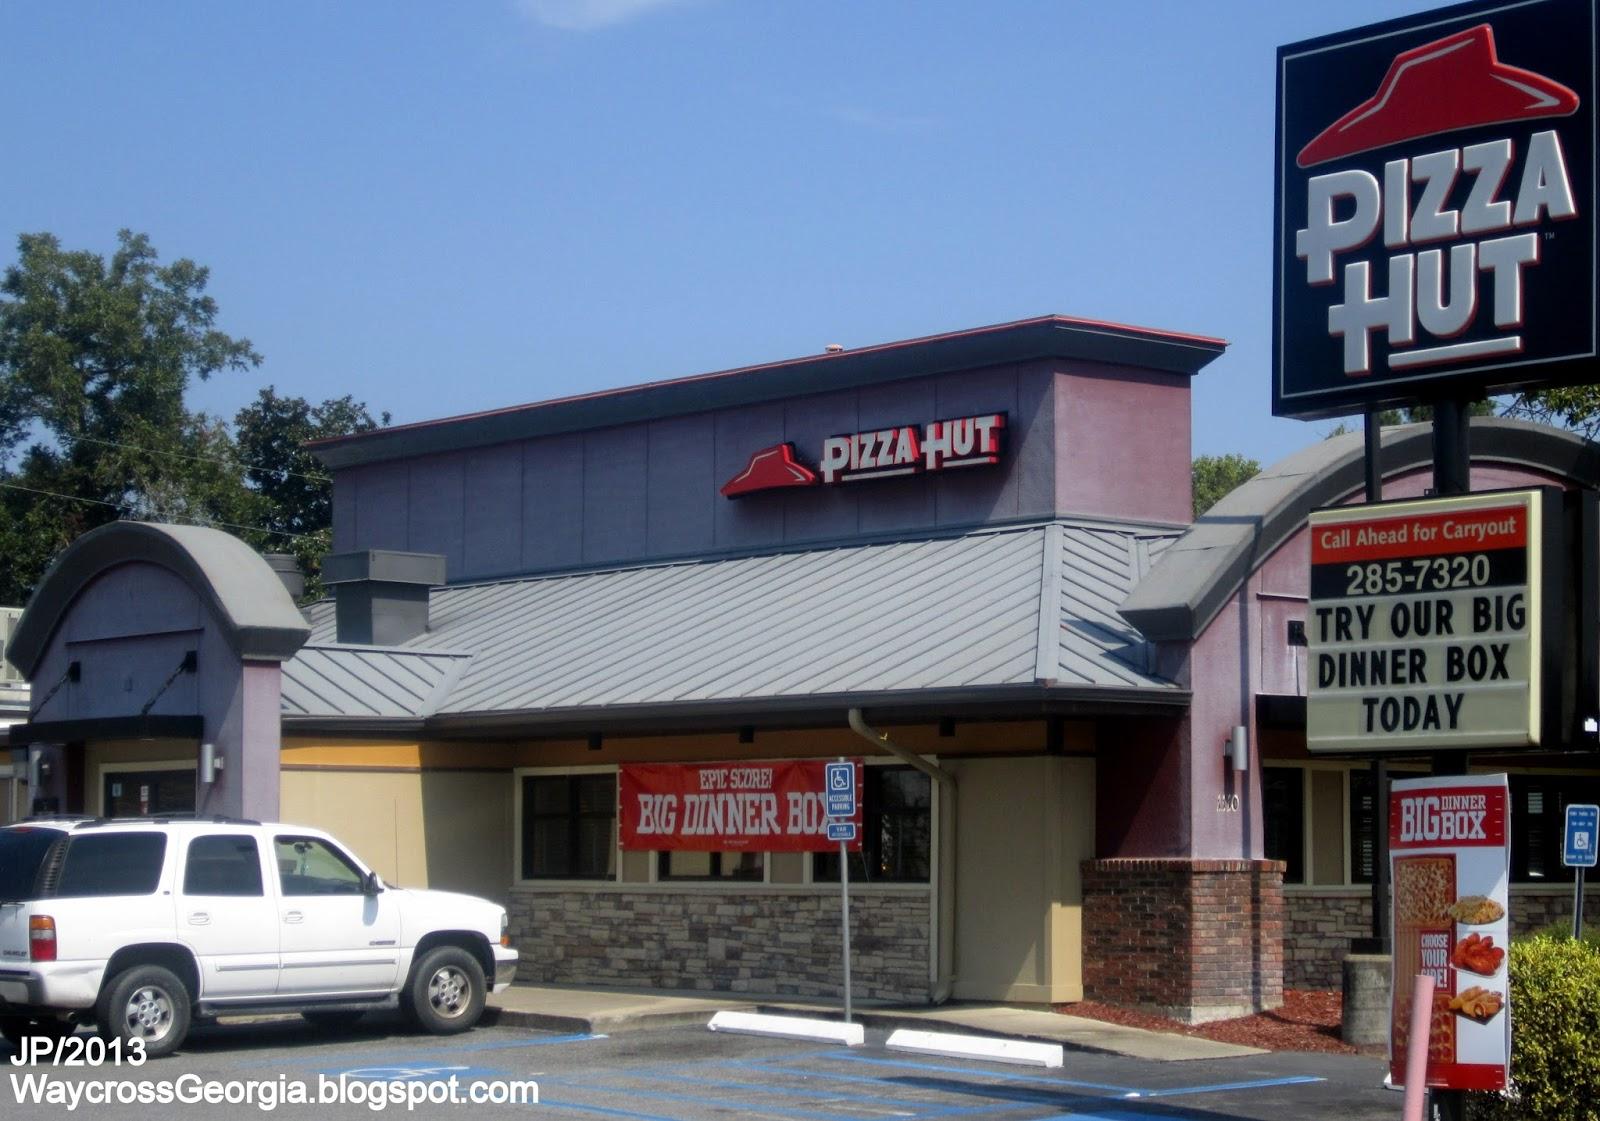 pizza hut clermont fl pizza hut 750 e highway 50 restaurant fast